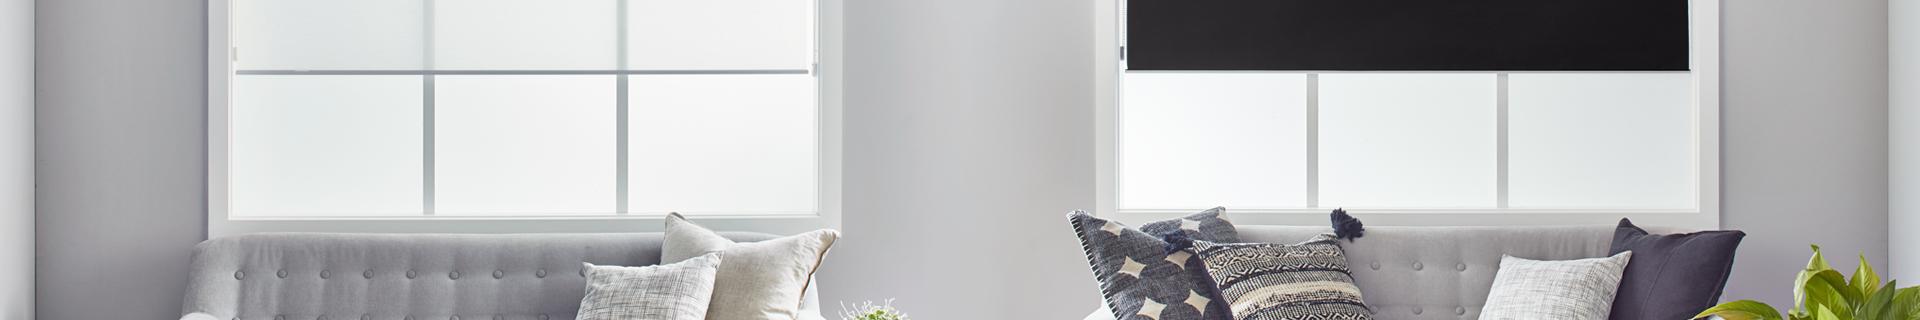 Living room with black roller blinds.